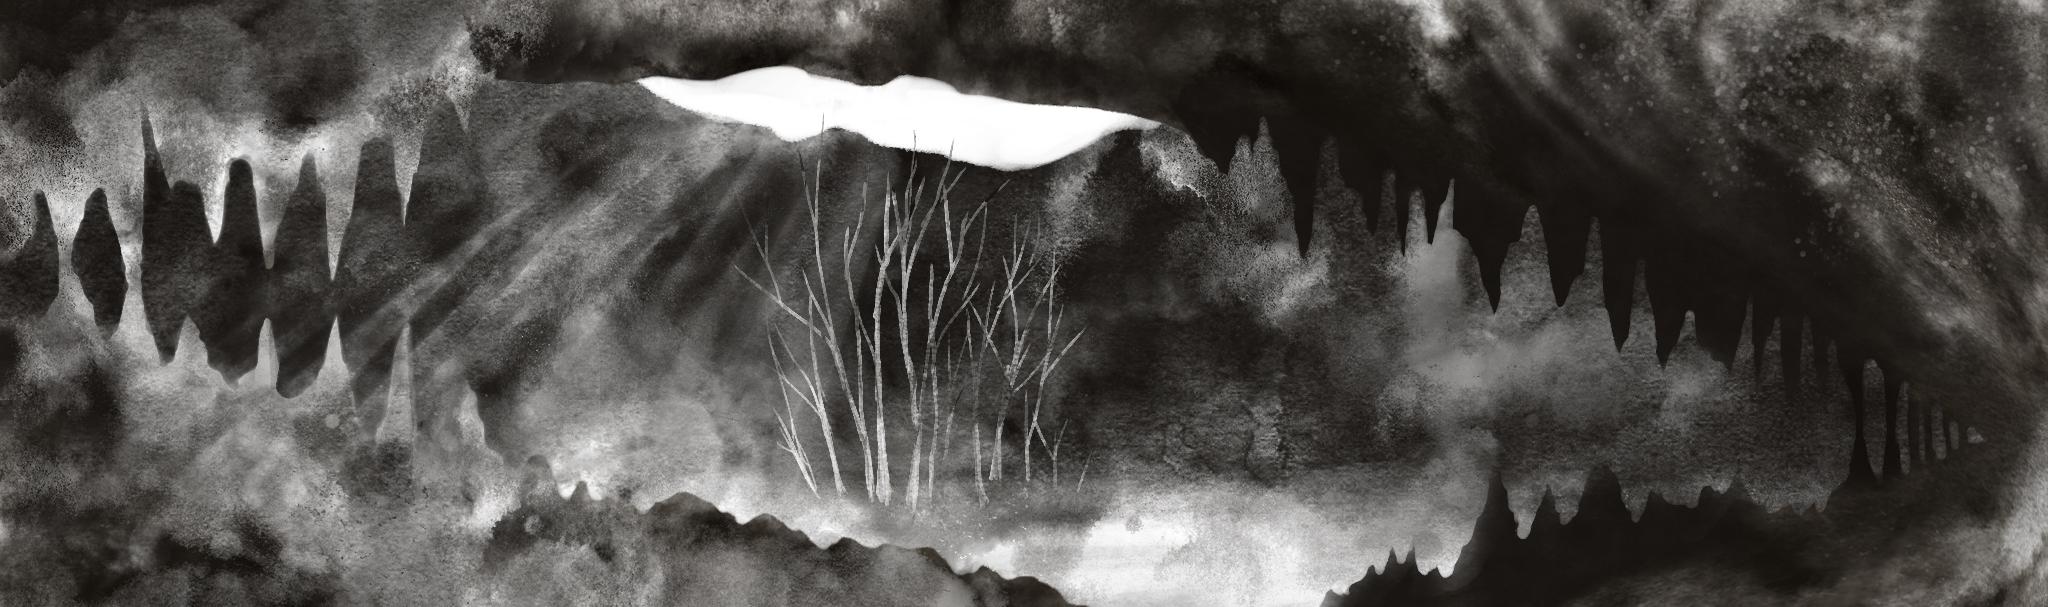 Cave in progress, by Amanda Spaid